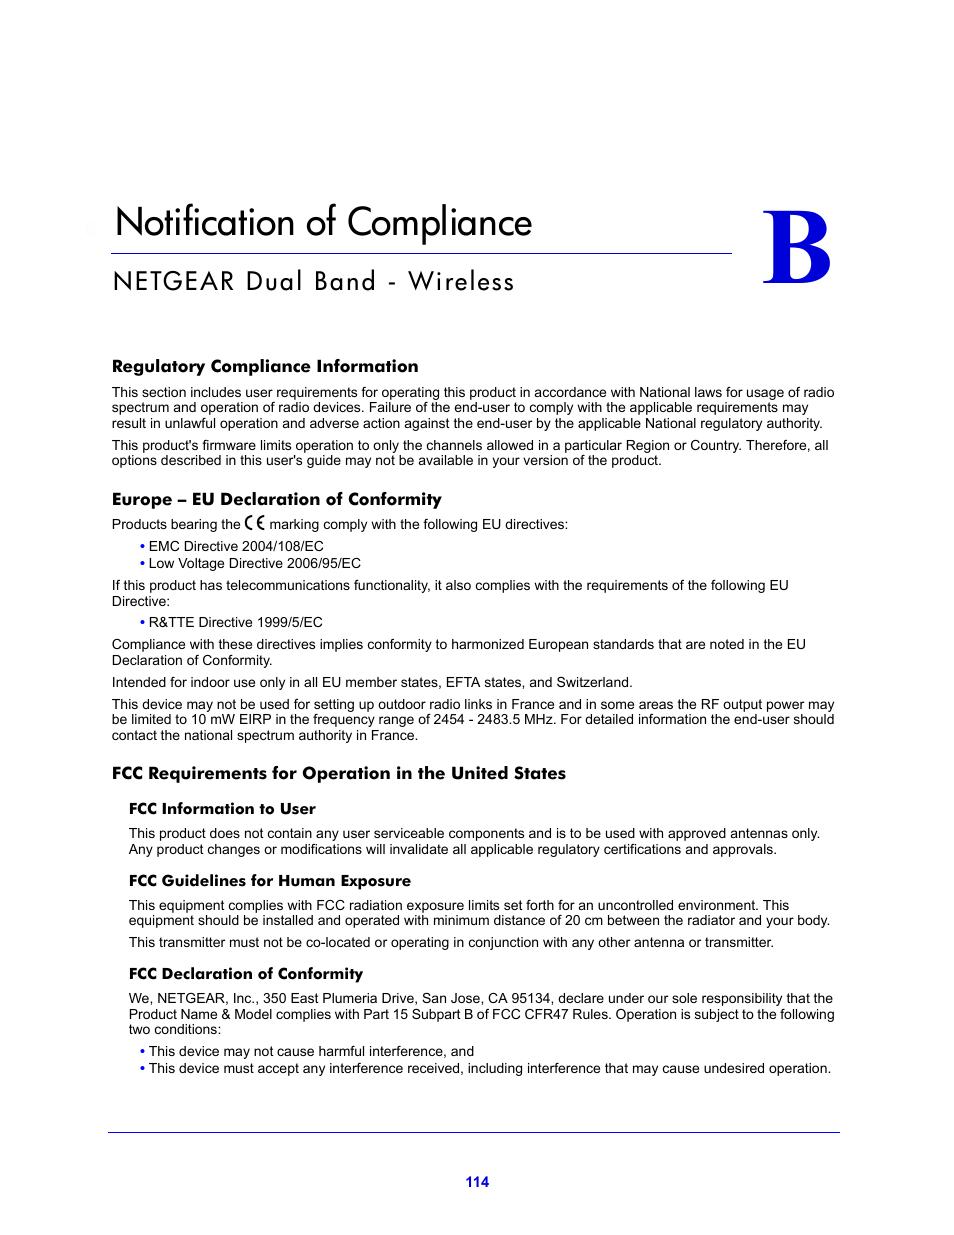 b notification of compliance appendix b notification of compliance rh manualsdir com state operations manual appendix b revised state operations manual appendix b 2017